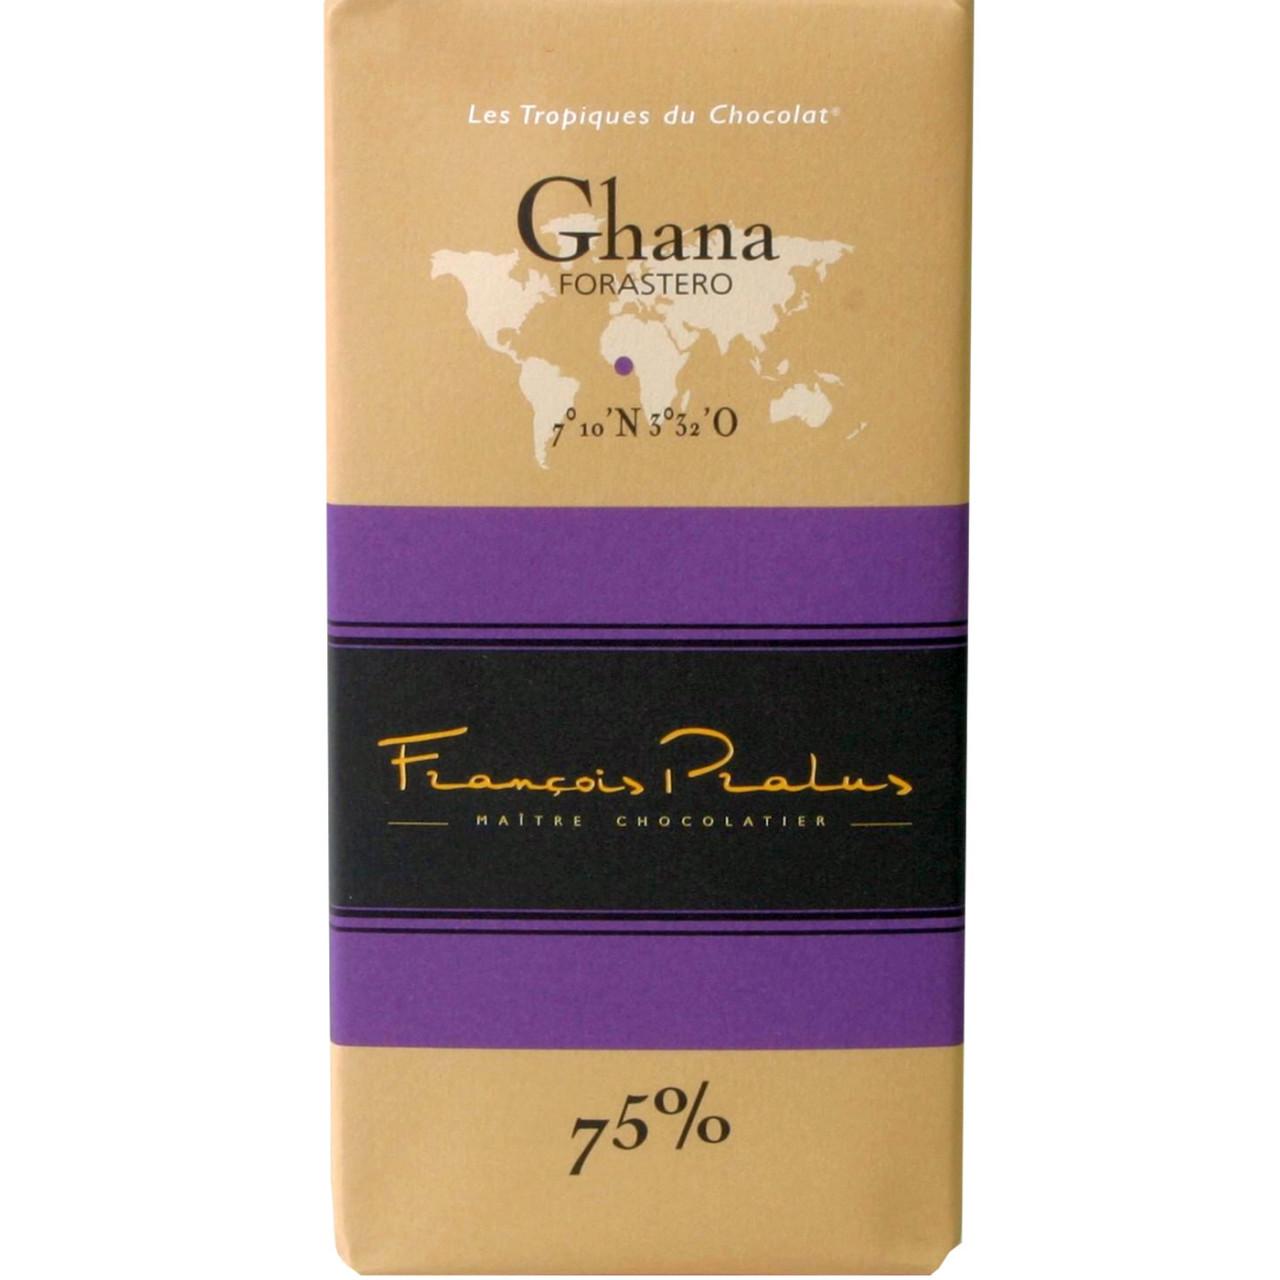 dunkle Schokolade, 75% Ghana, Forastero, Afrika, Africa, Afrique, dark chocolate, chocolat noir, single origin chocolate - $seoKeywords- Chocolats-De-Luxe